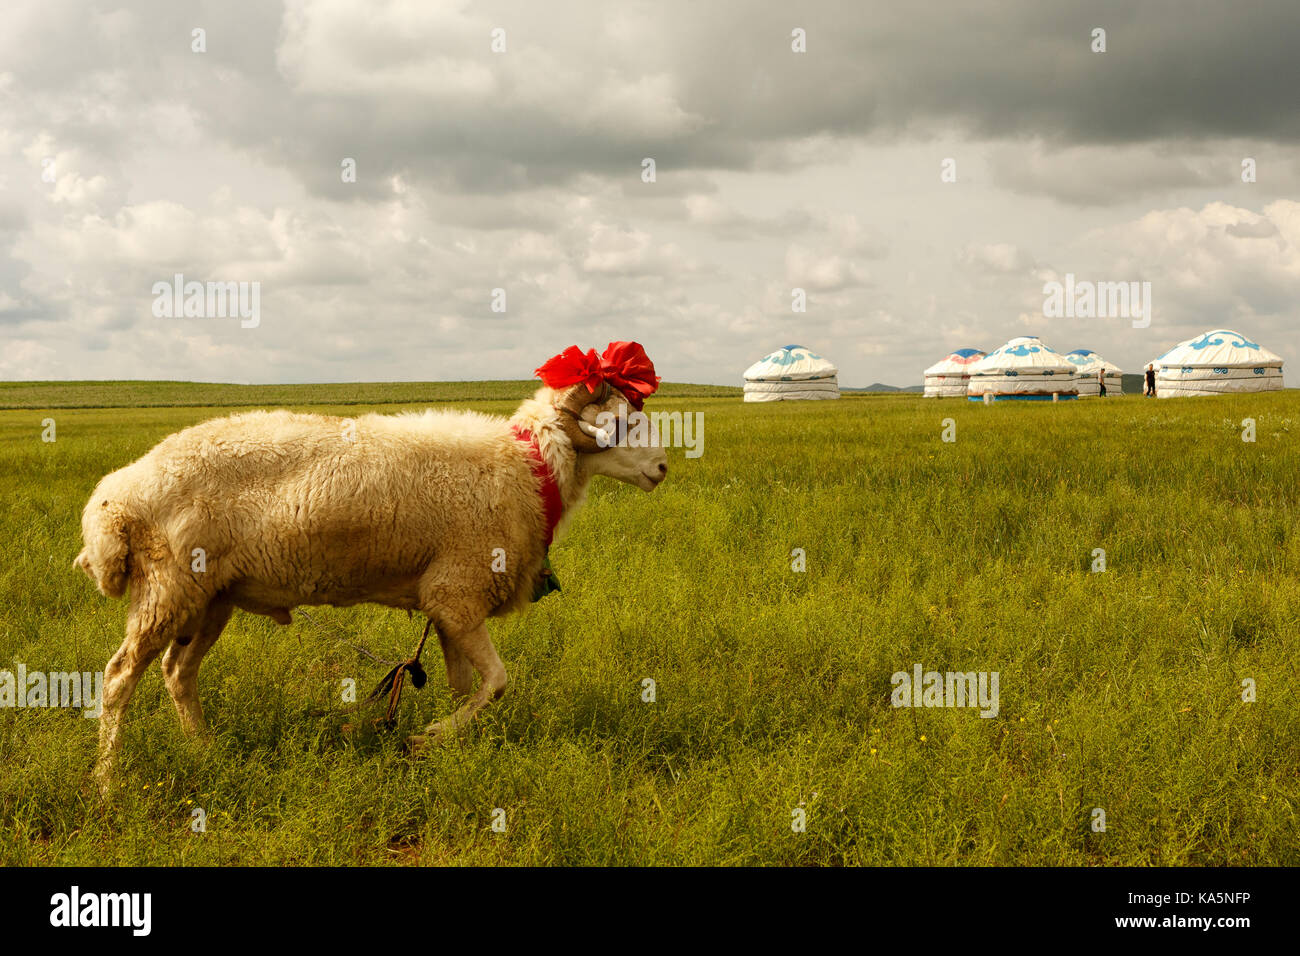 Fancy ovejas en praderas de Mongolia Imagen De Stock